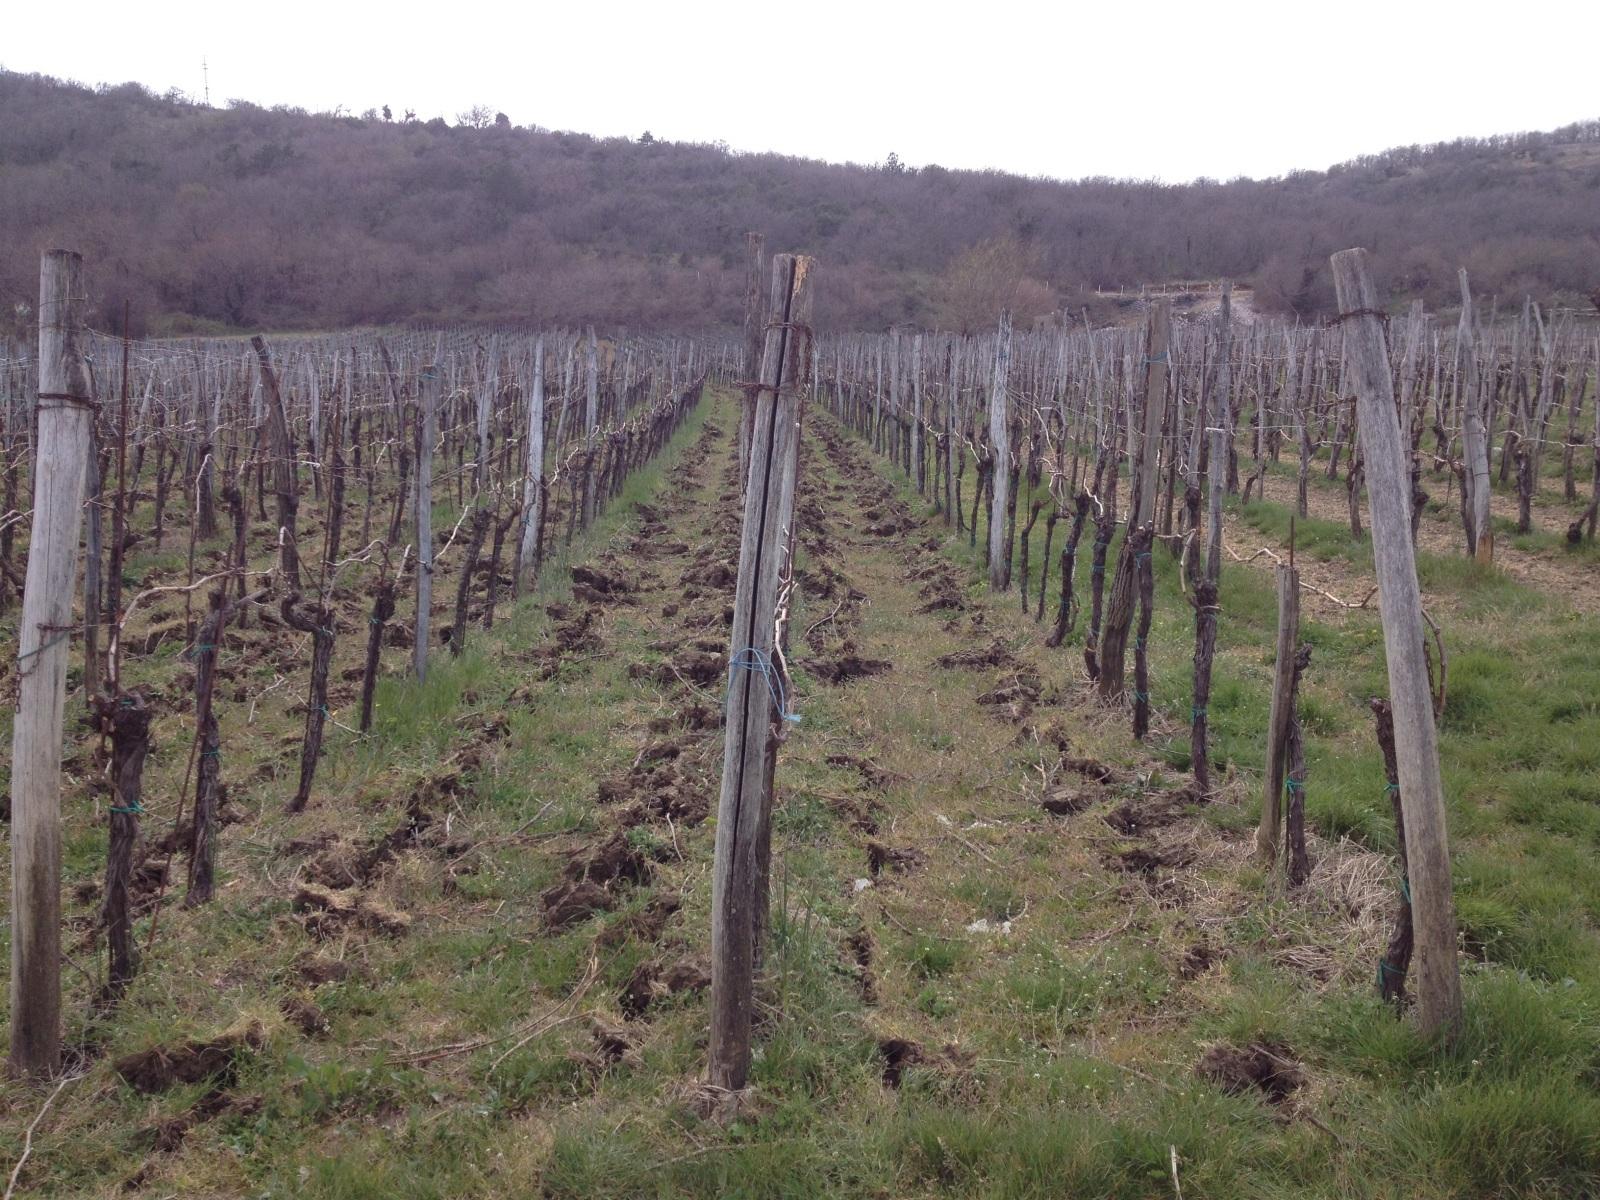 Radovi & poslovi u vinogradu - Page 3 V64qb7